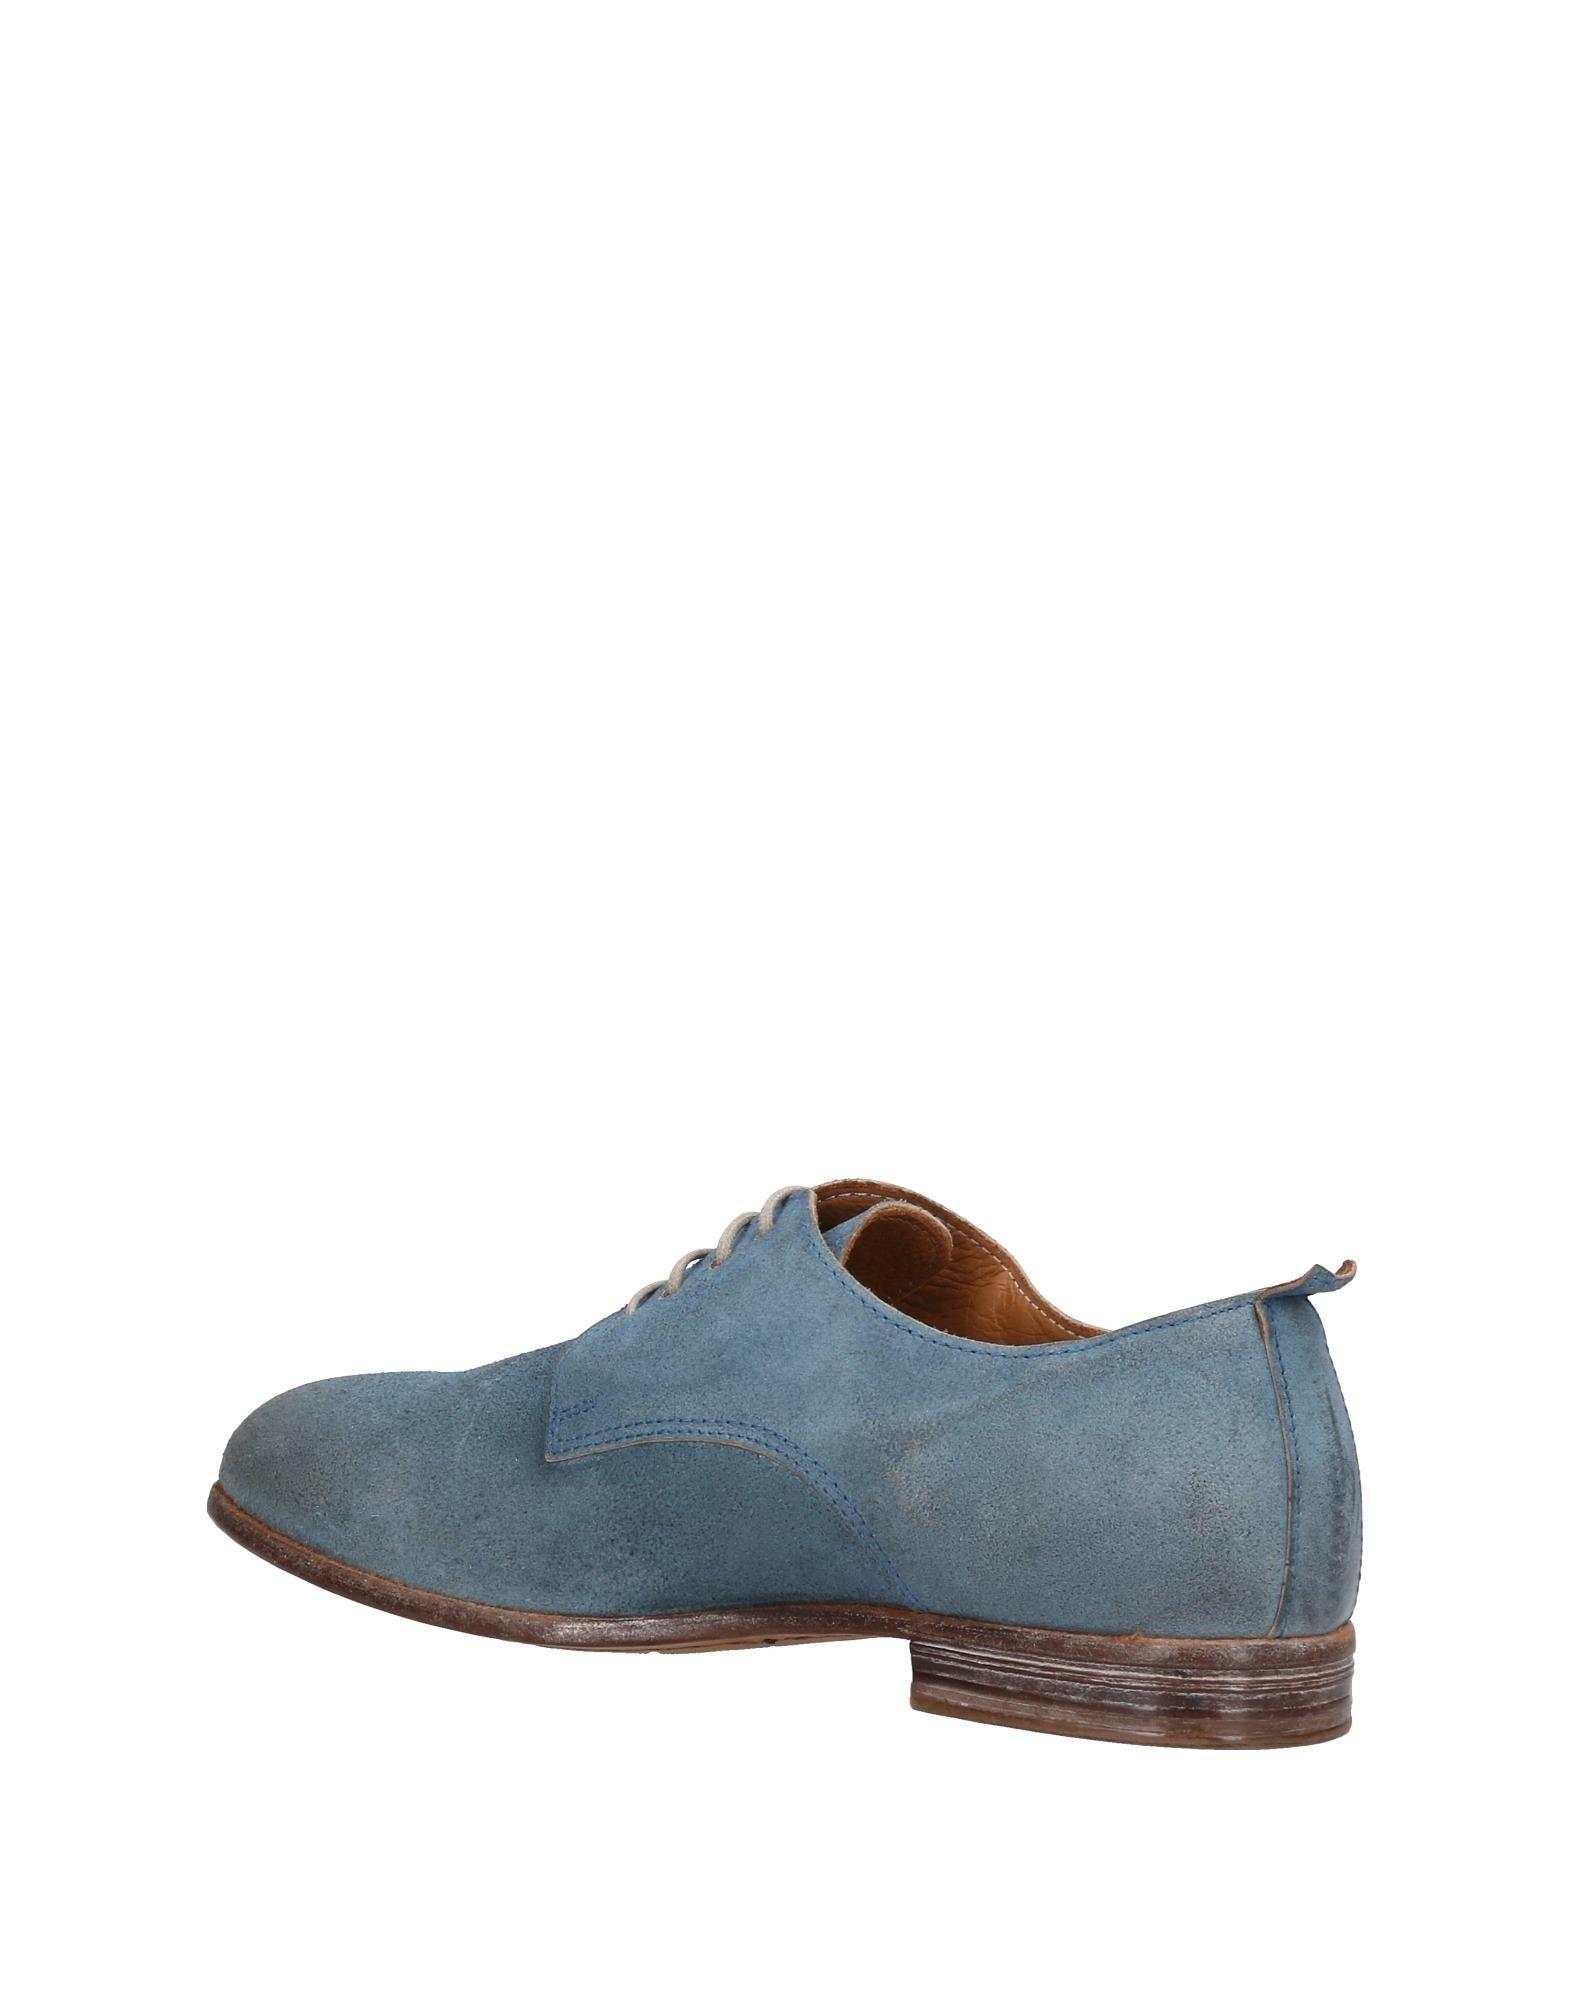 Moma Schnürschuhe Schuhe Damen  11412356DJ Heiße Schuhe Schnürschuhe b9e7bc